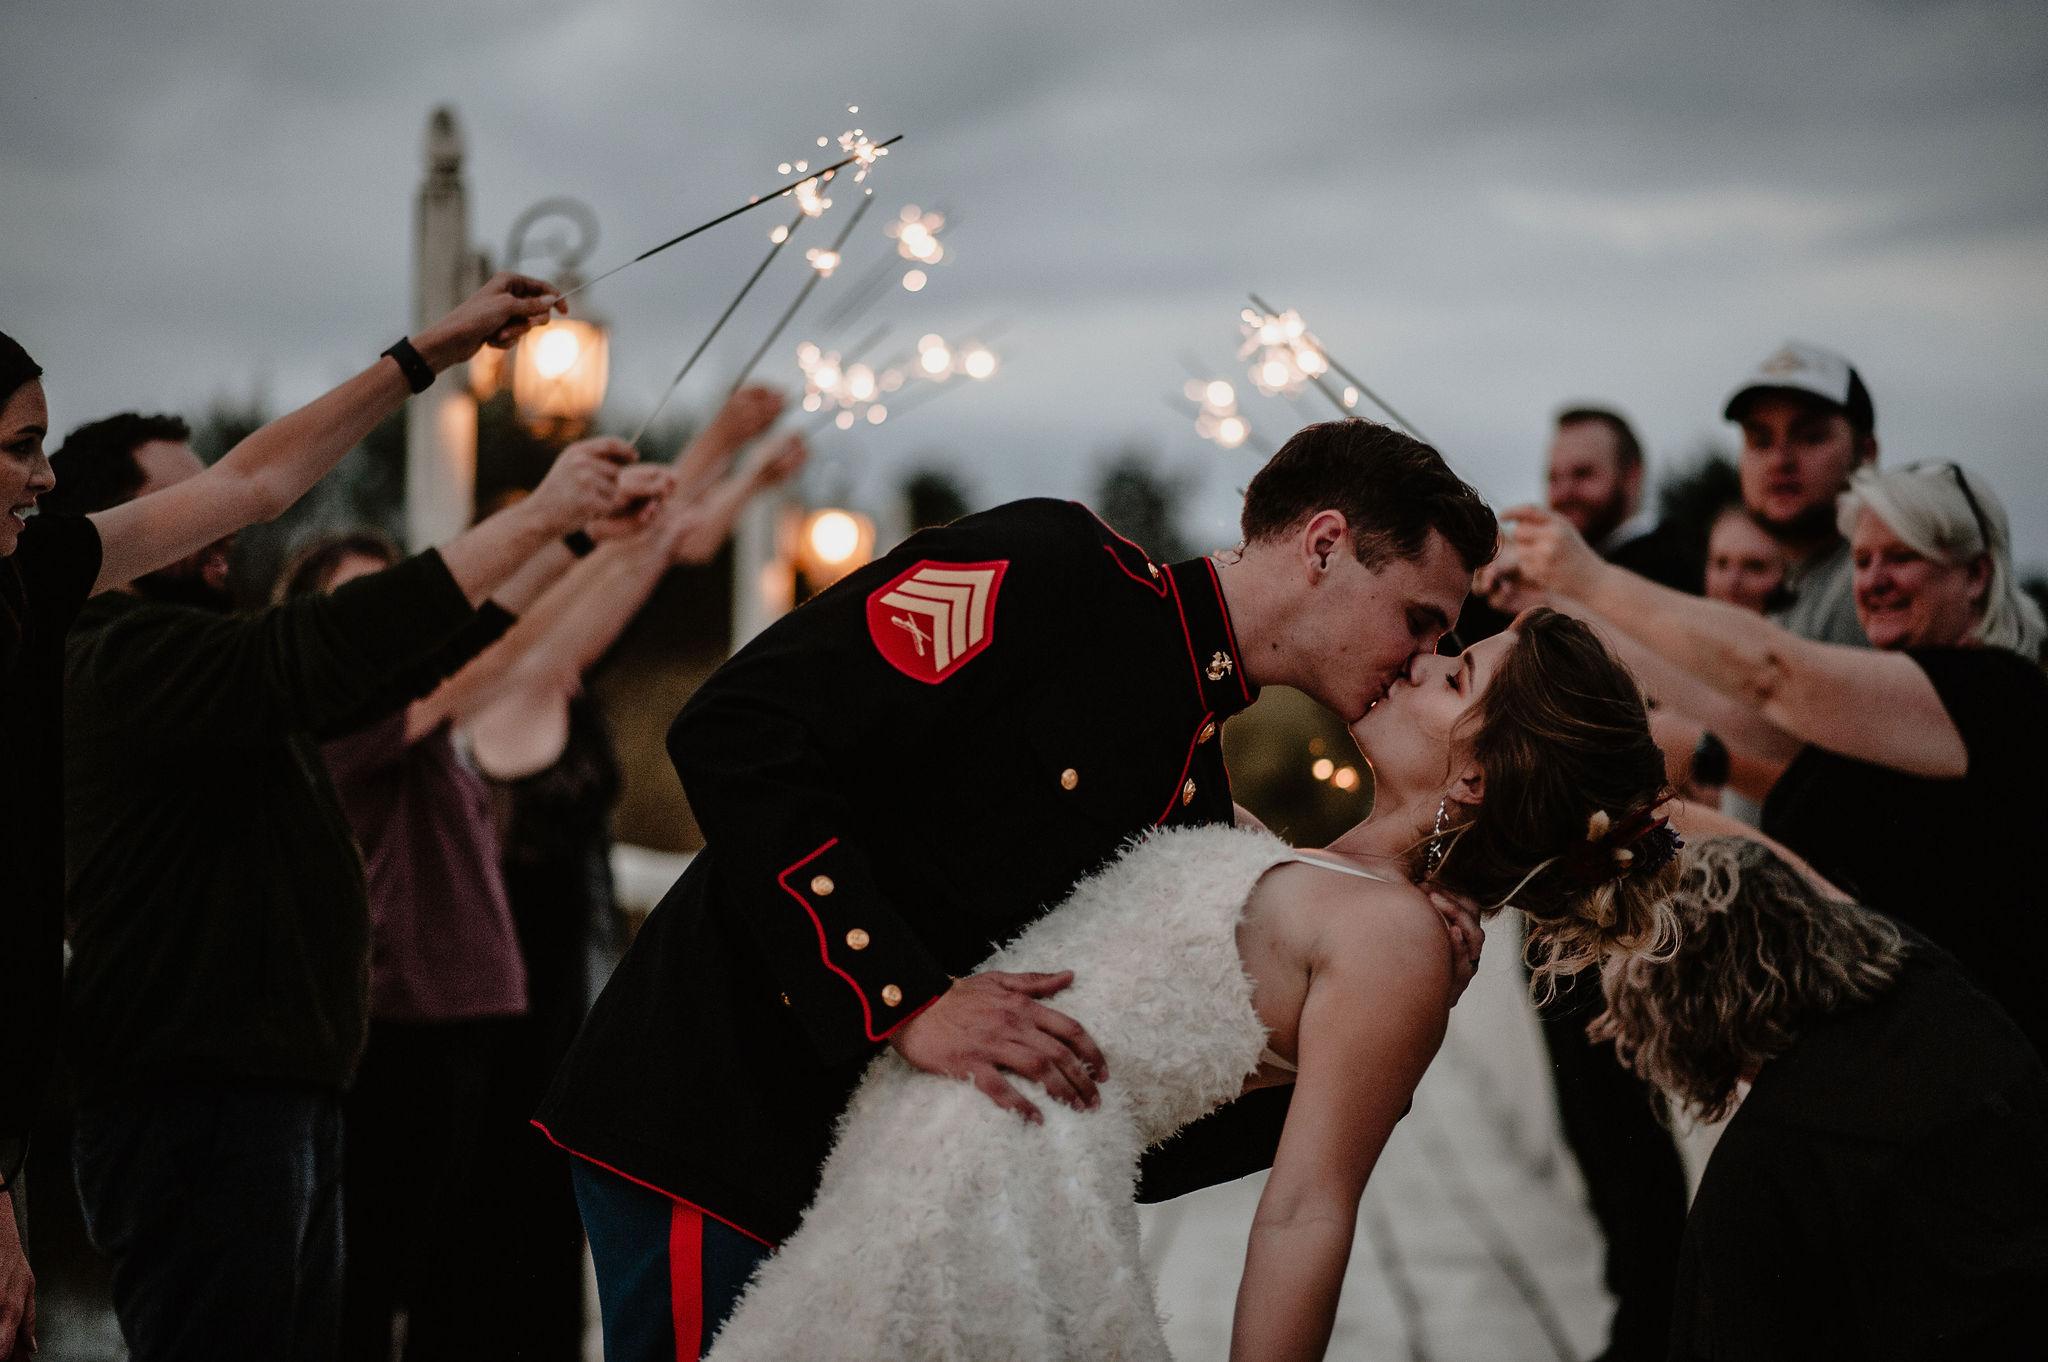 Military wedding, wedding sparklers